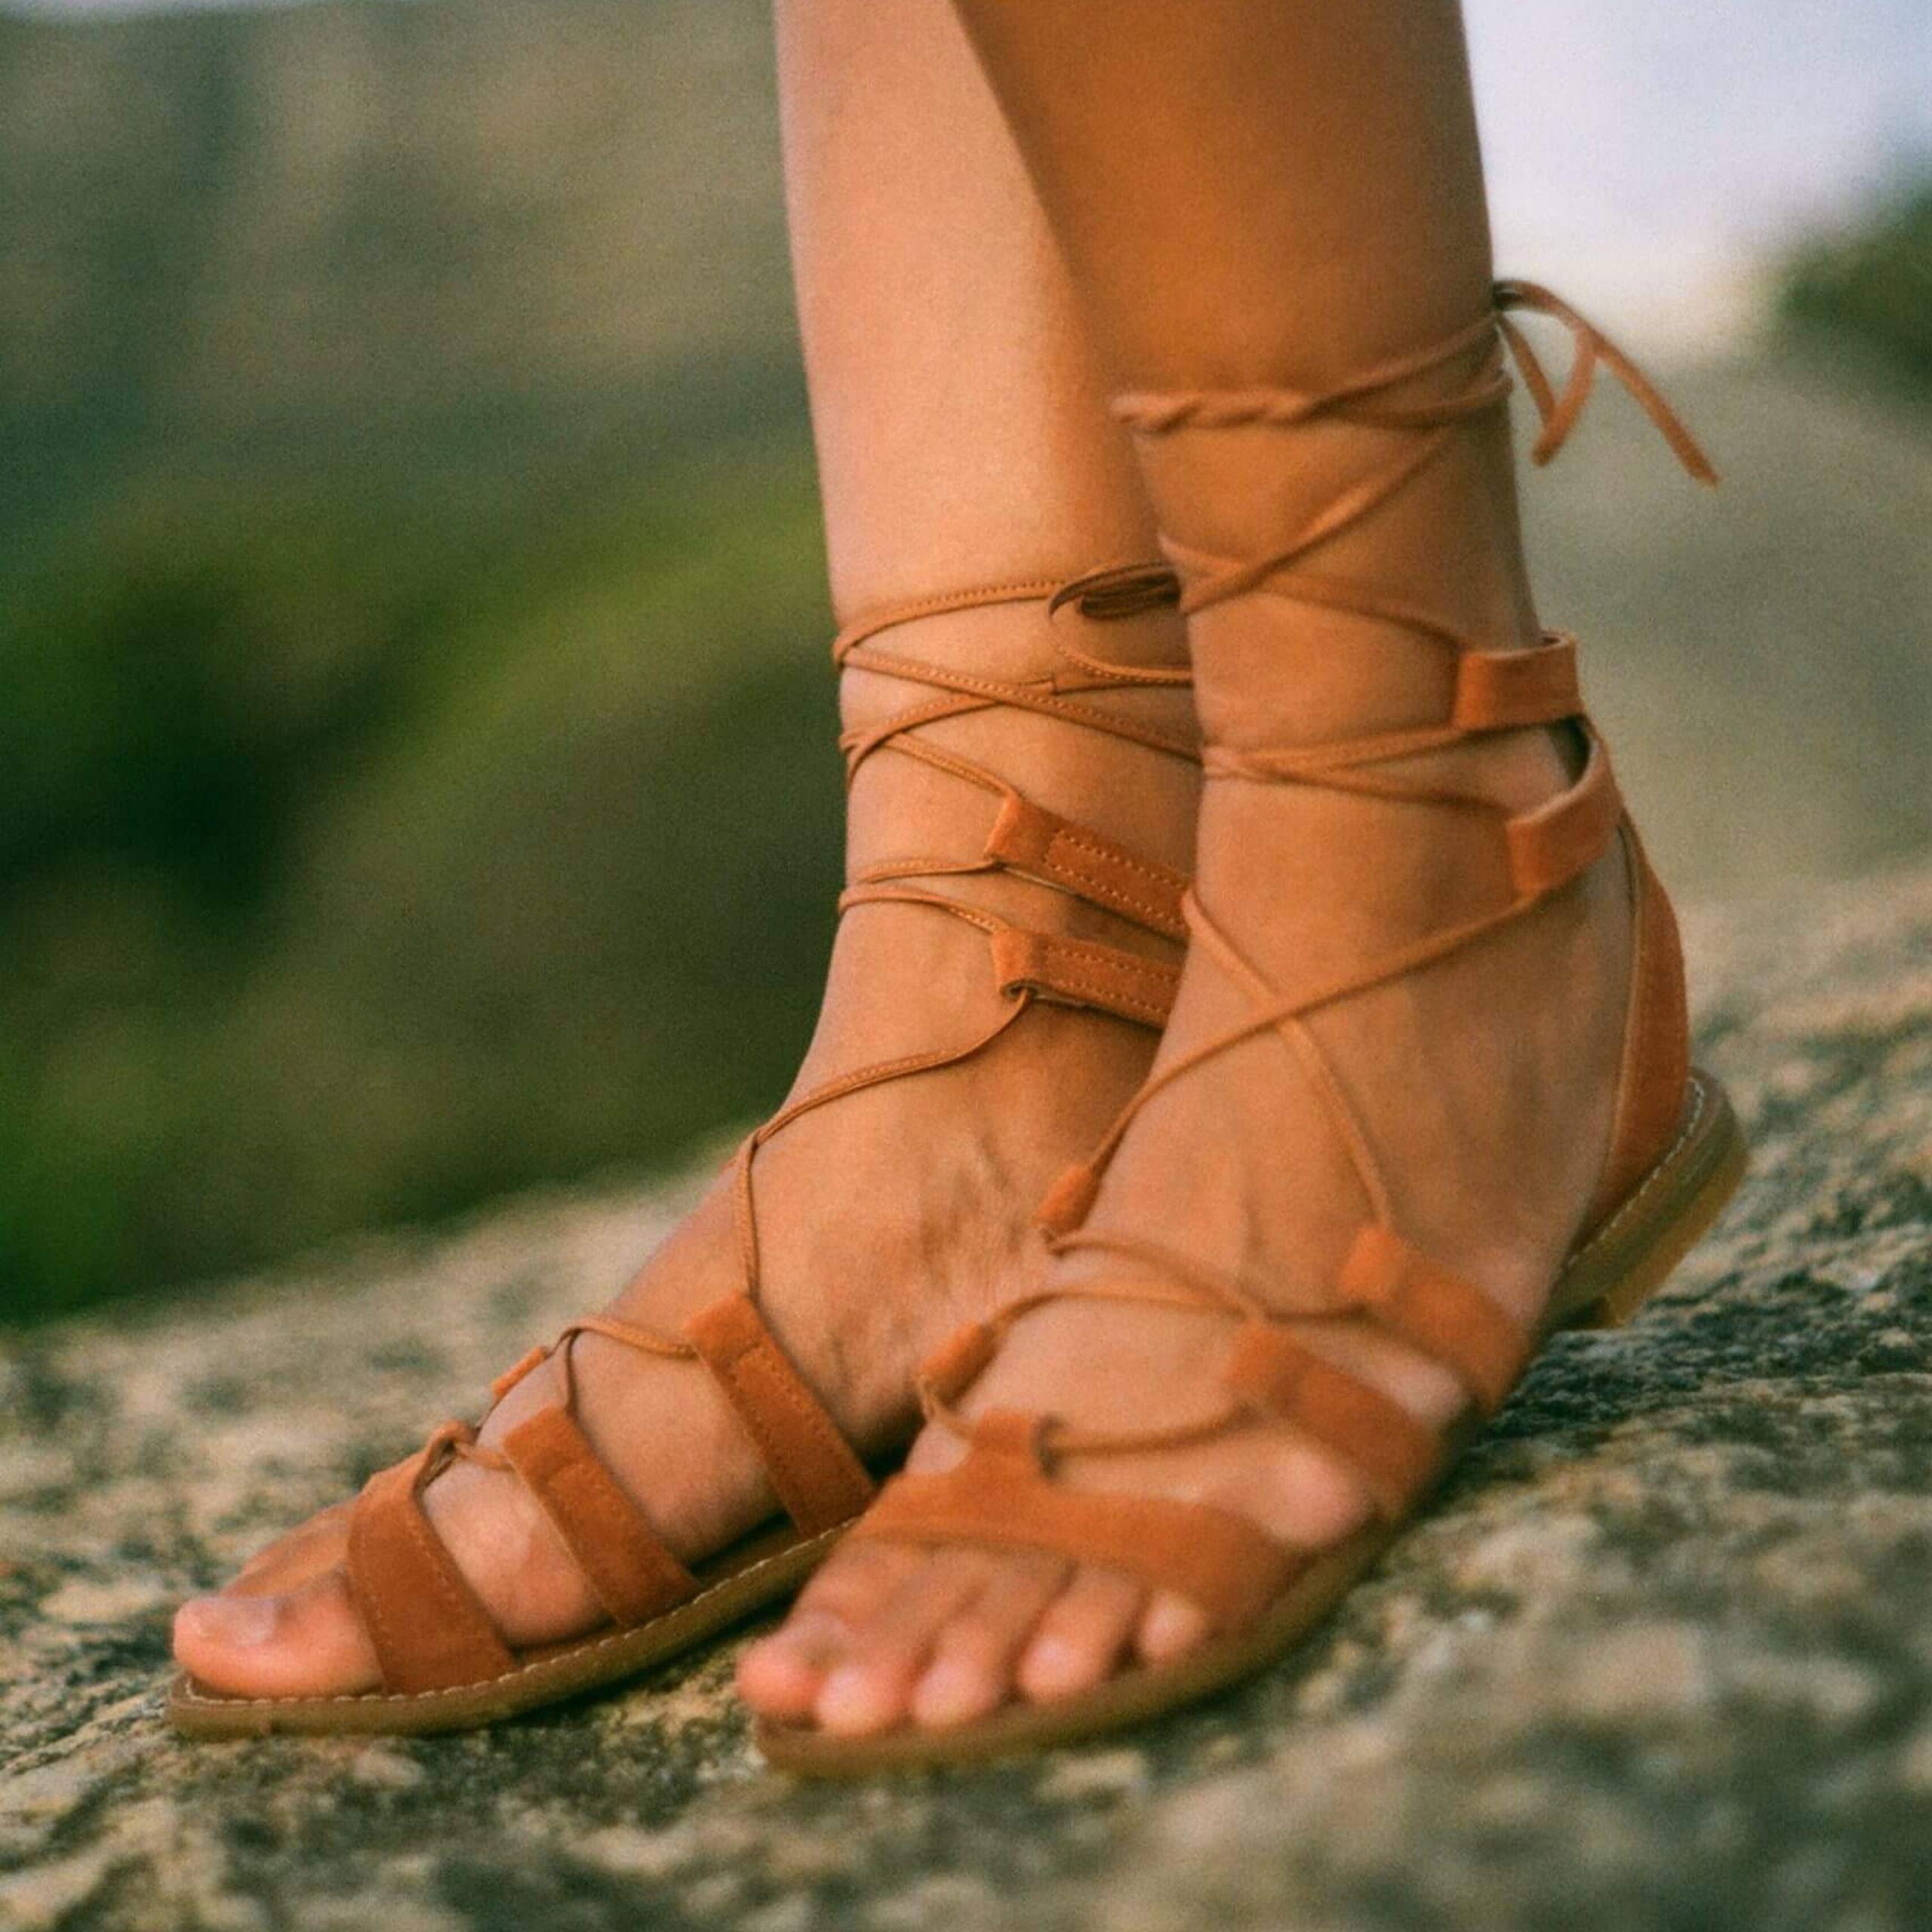 fe-2_lintsandalen sandals travelsandals vegan sustainable sandals wikkelsandalen